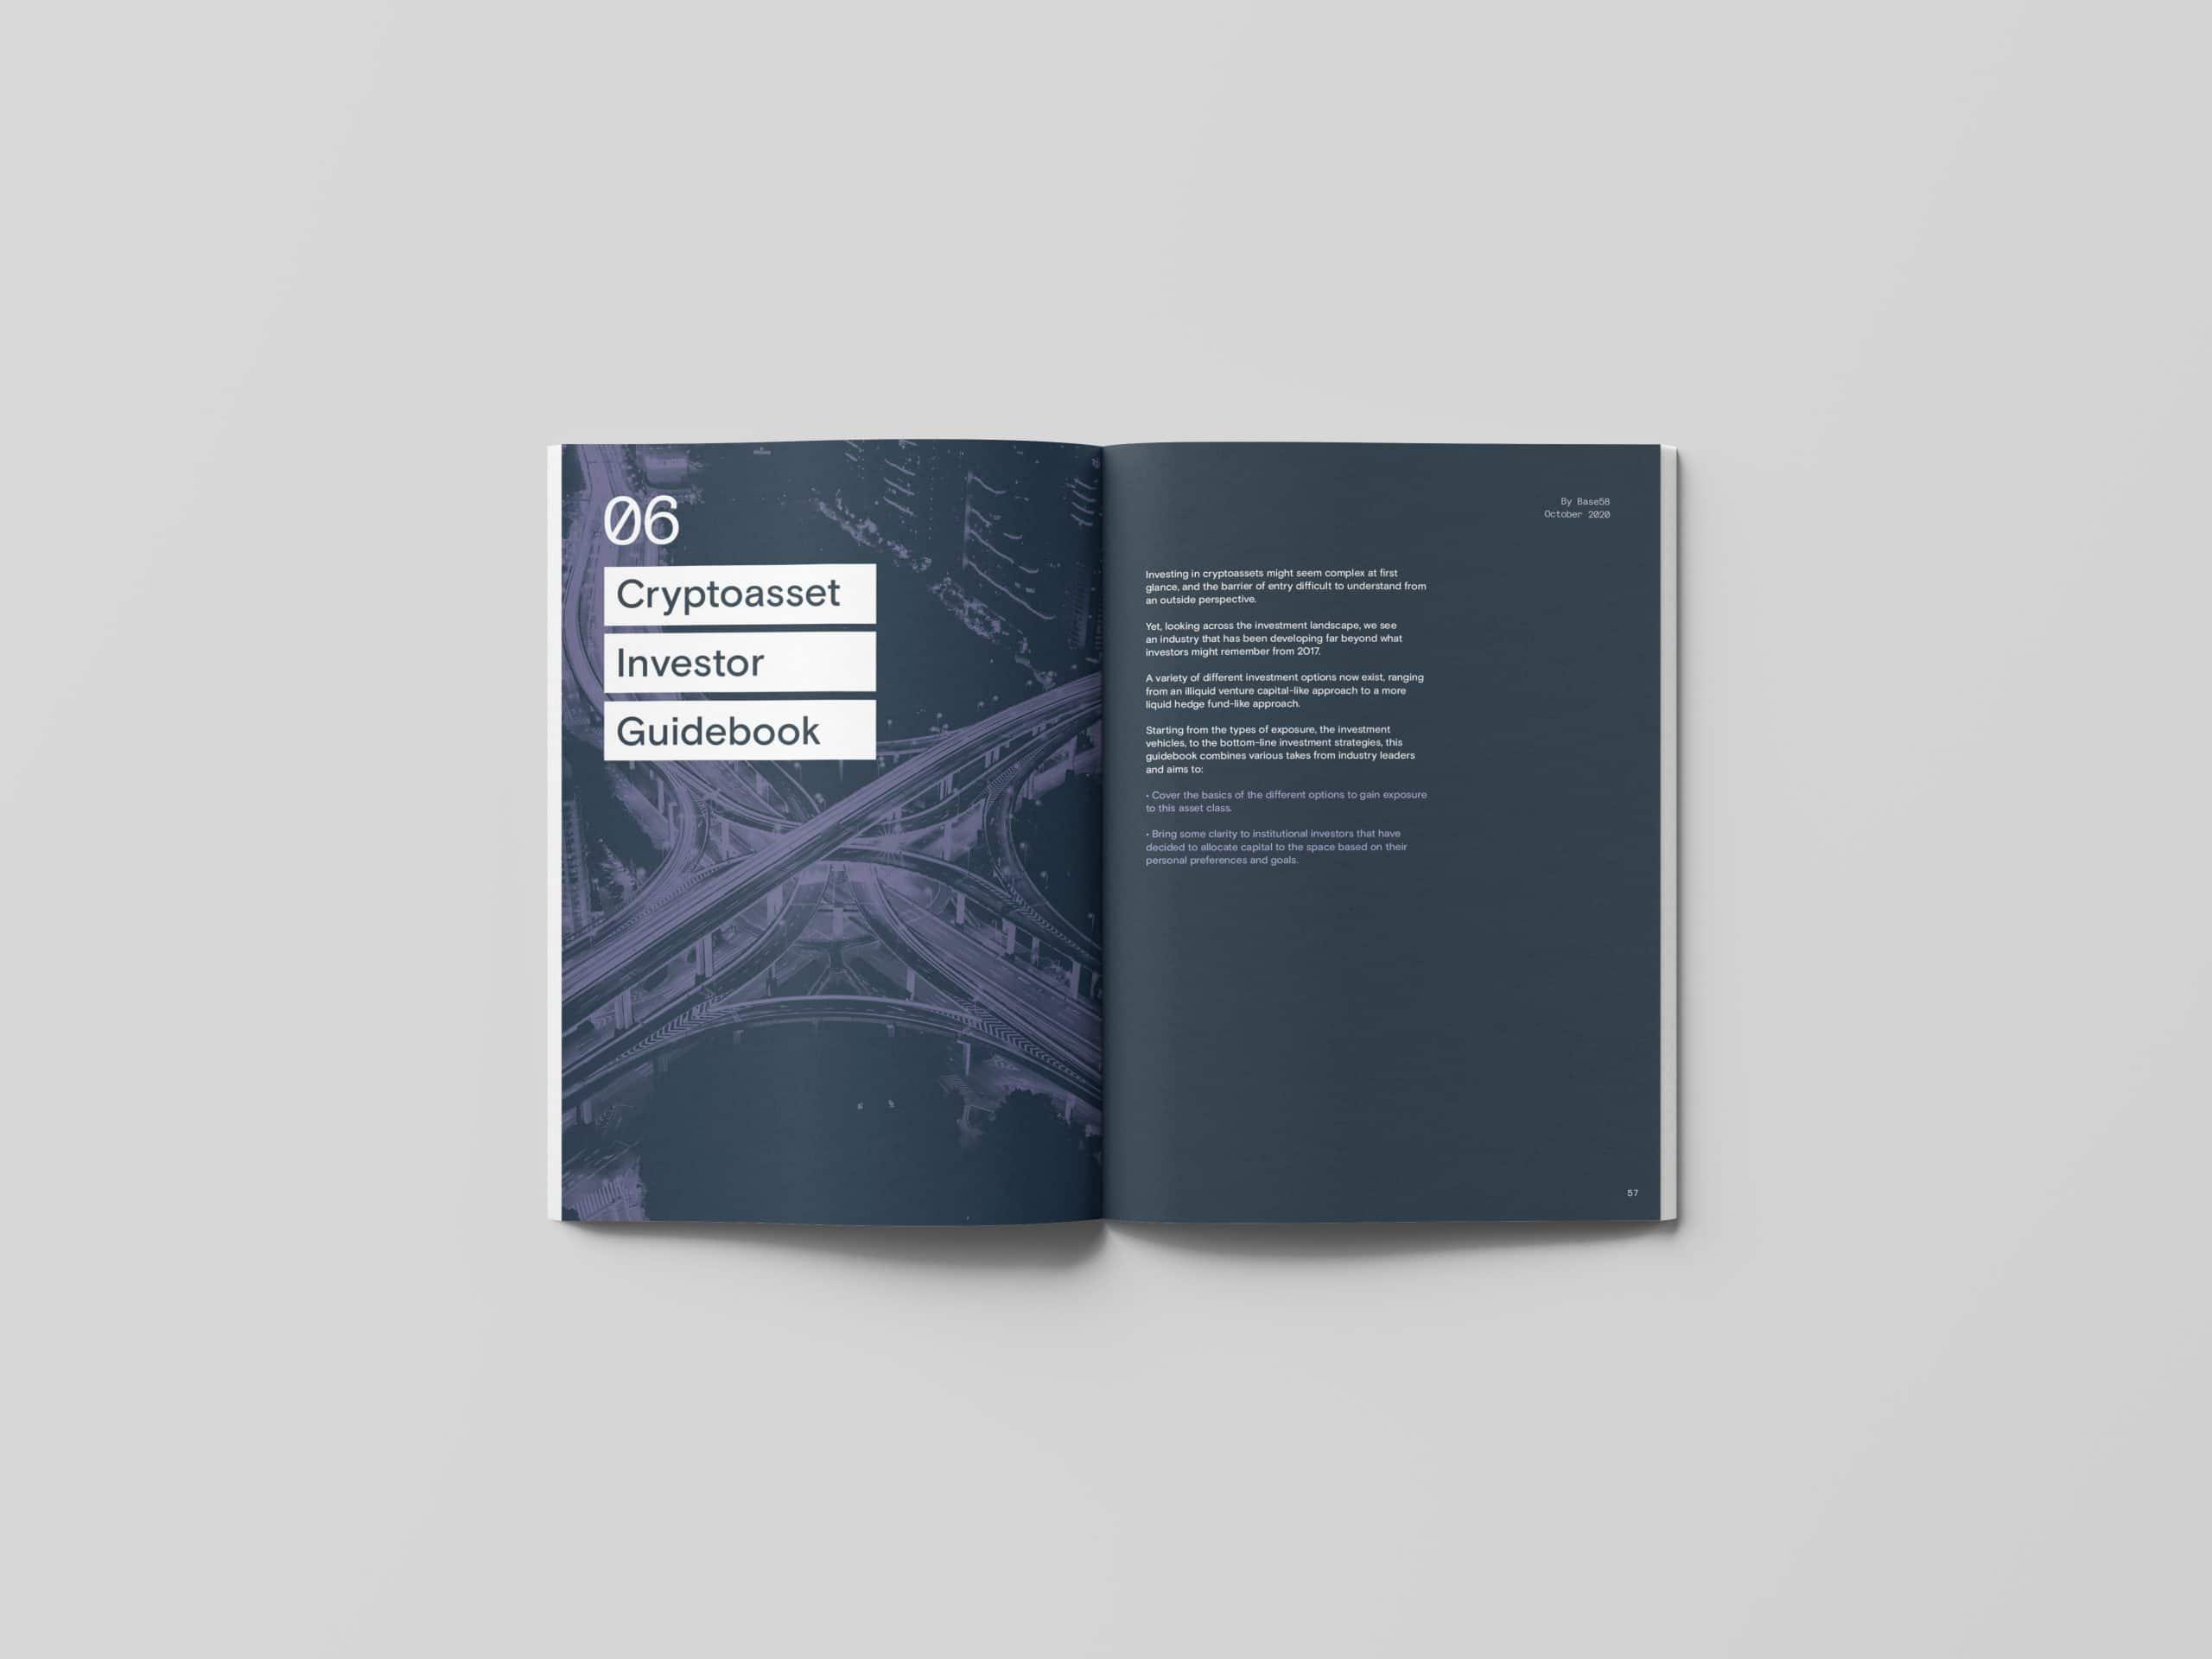 mimosa - brand consultancy - digital marketing agency - creative studio - Graphic design - Product design